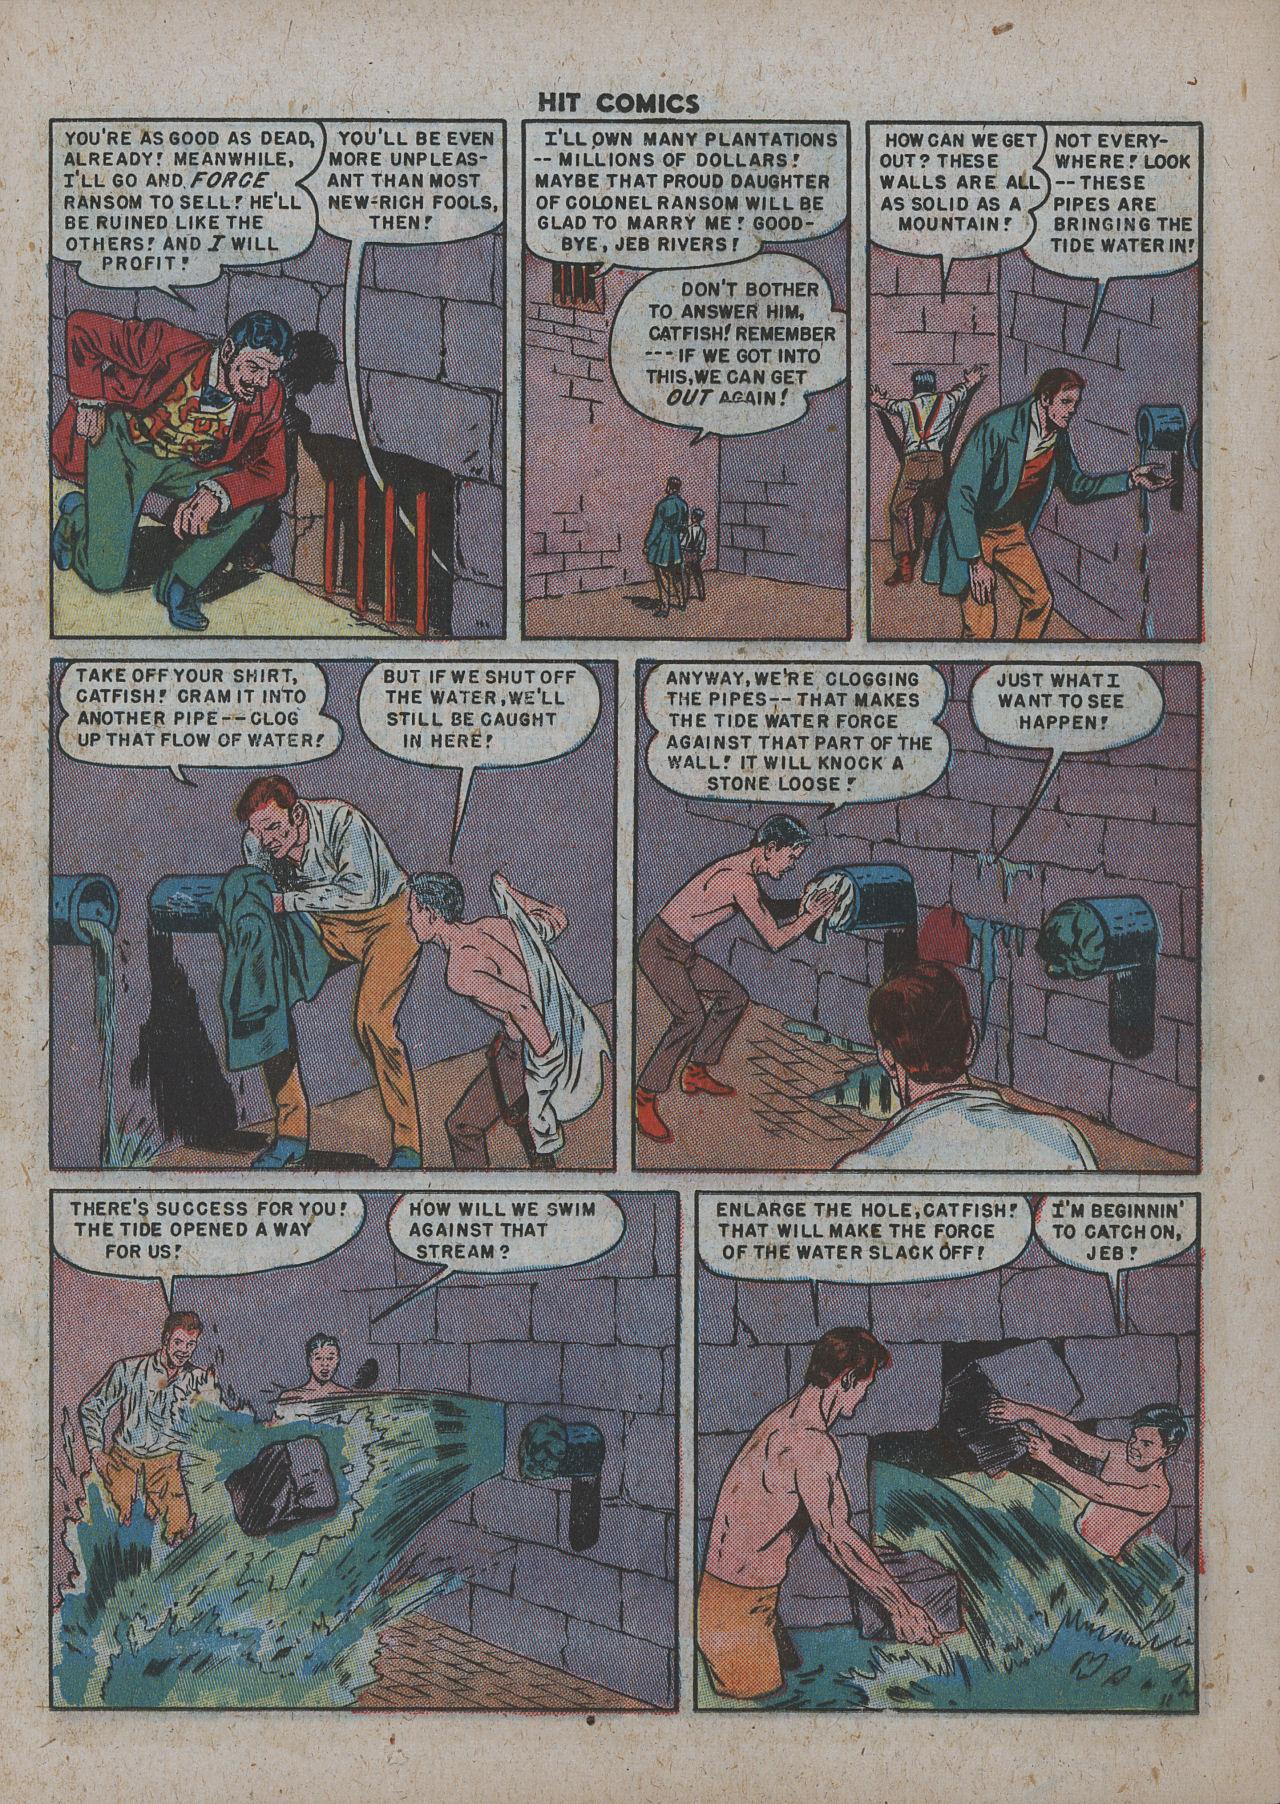 Read online Hit Comics comic -  Issue #63 - 13